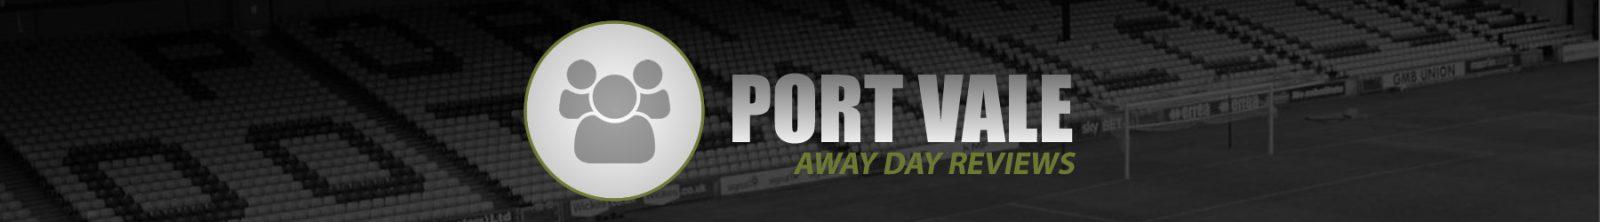 Review Port Vale